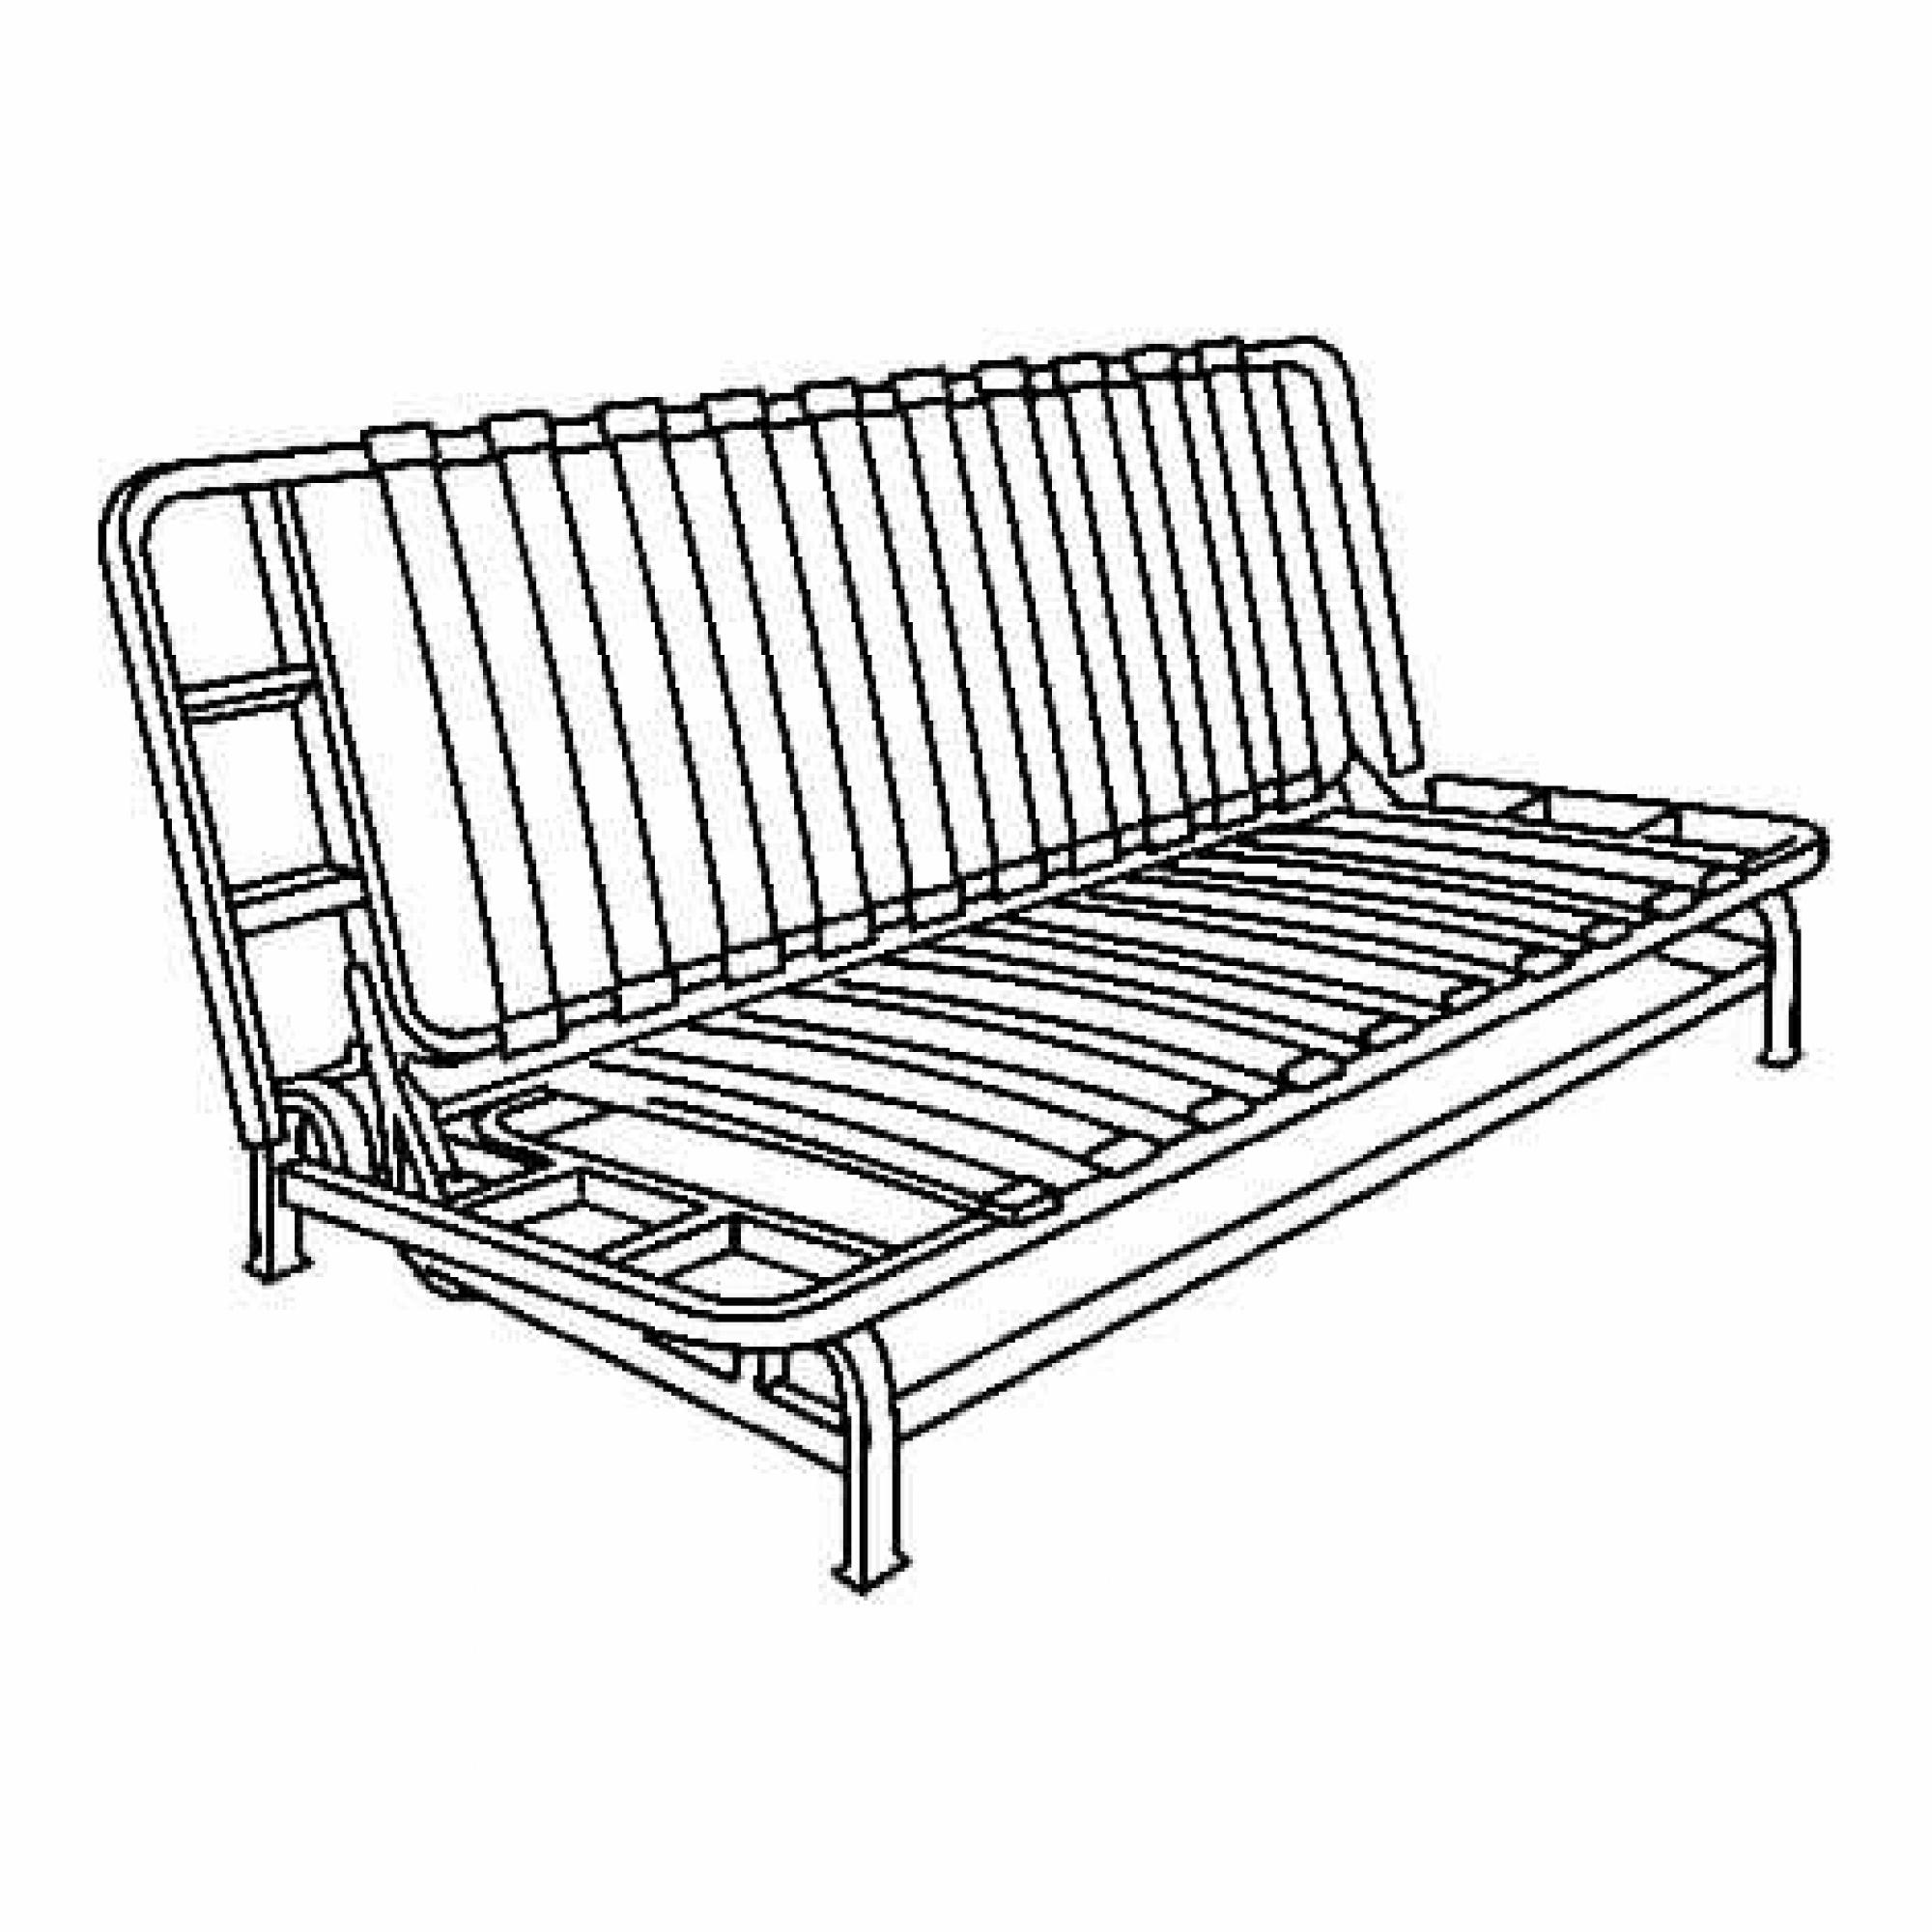 Exarby estructura sof cama 3 plazas for Estructura sofa cama